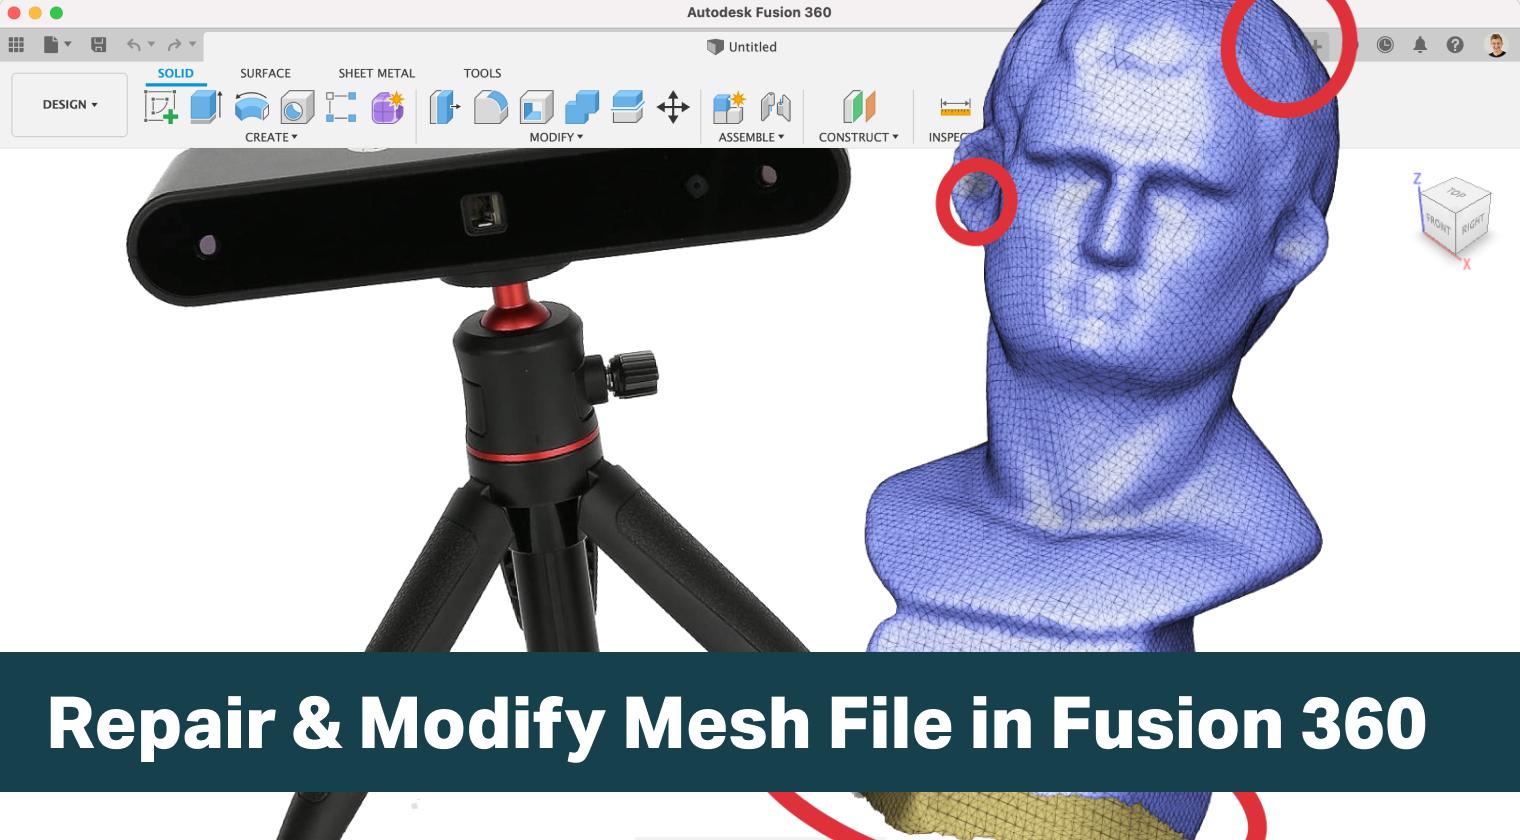 Repair and Modify Mesh file in Fusion 360